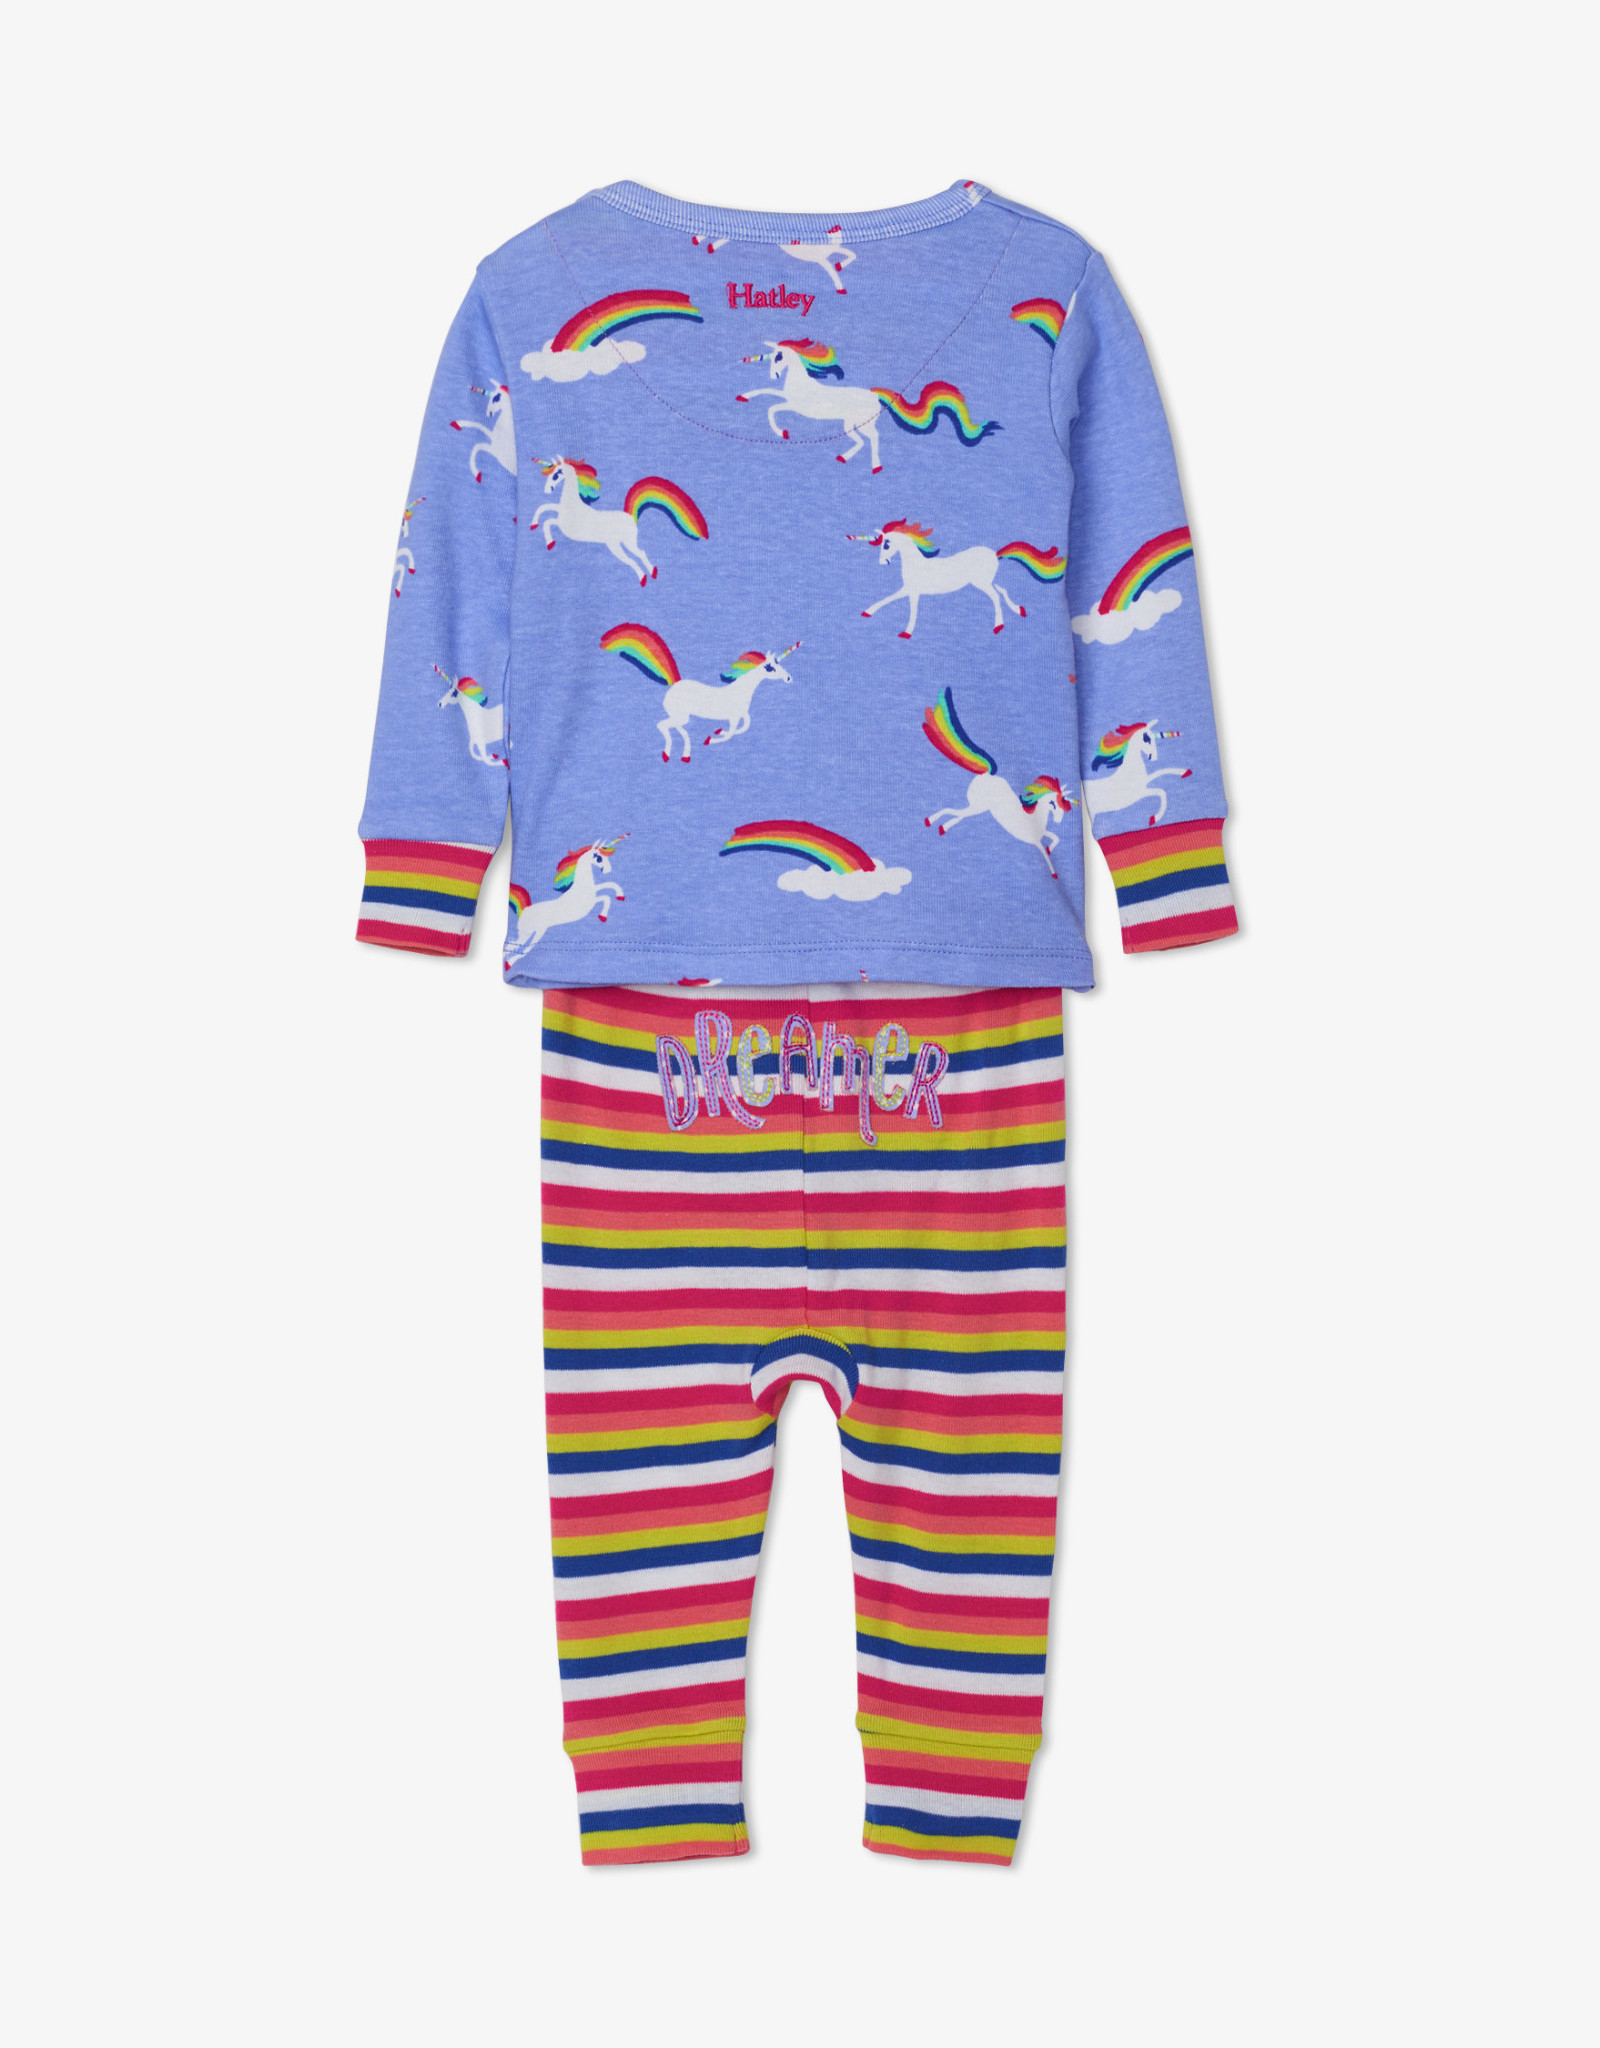 Hatley Rainbow Unicorns Organic Cotton Baby Pajama Set